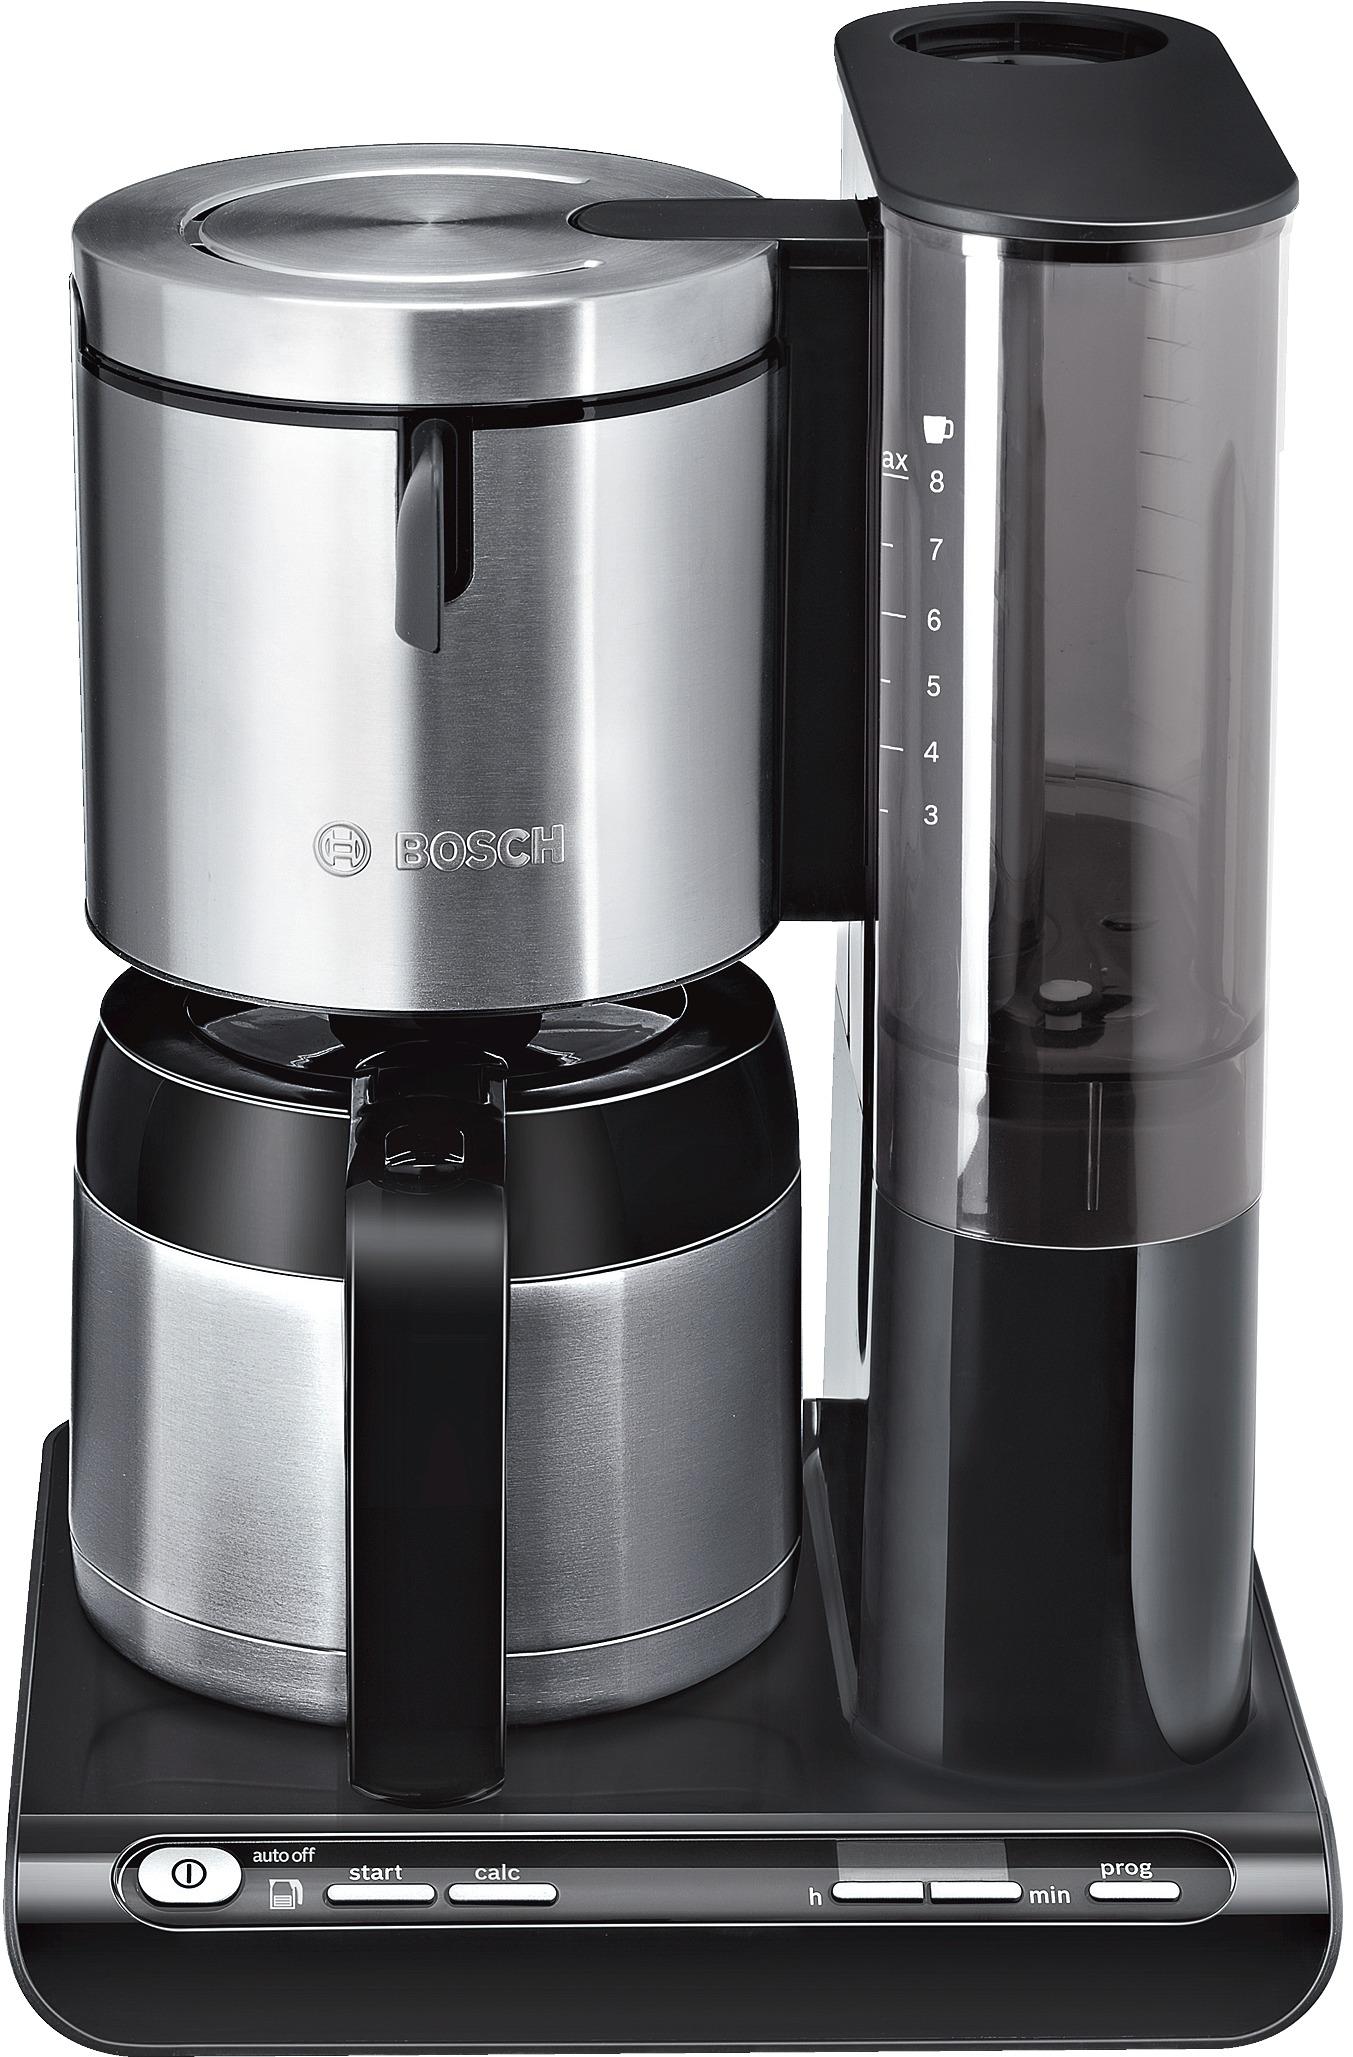 Bosch TKA8653 koffiefilter apparaat